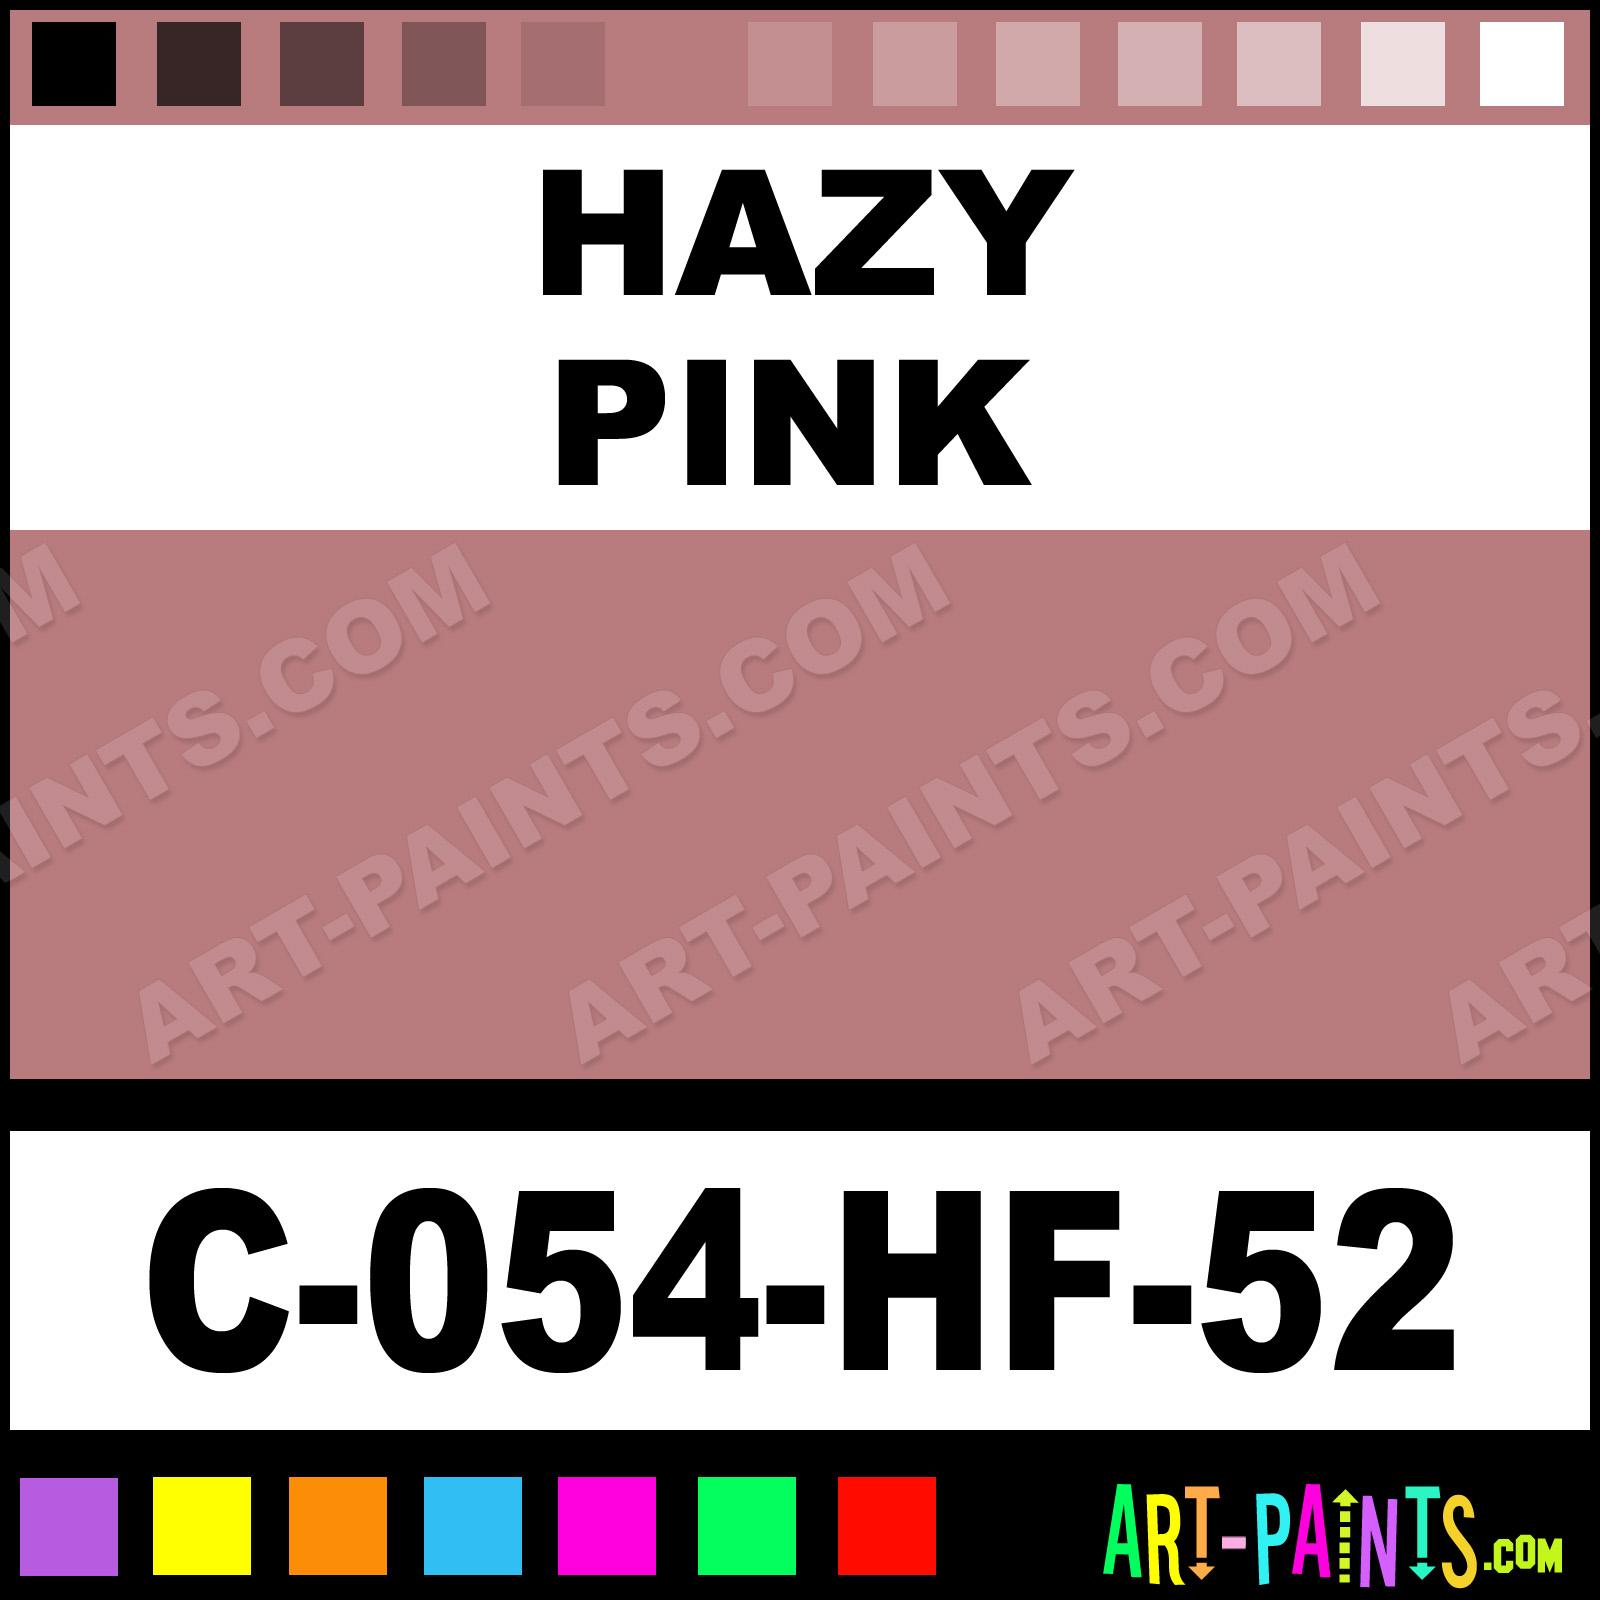 Hazy Pink Paint